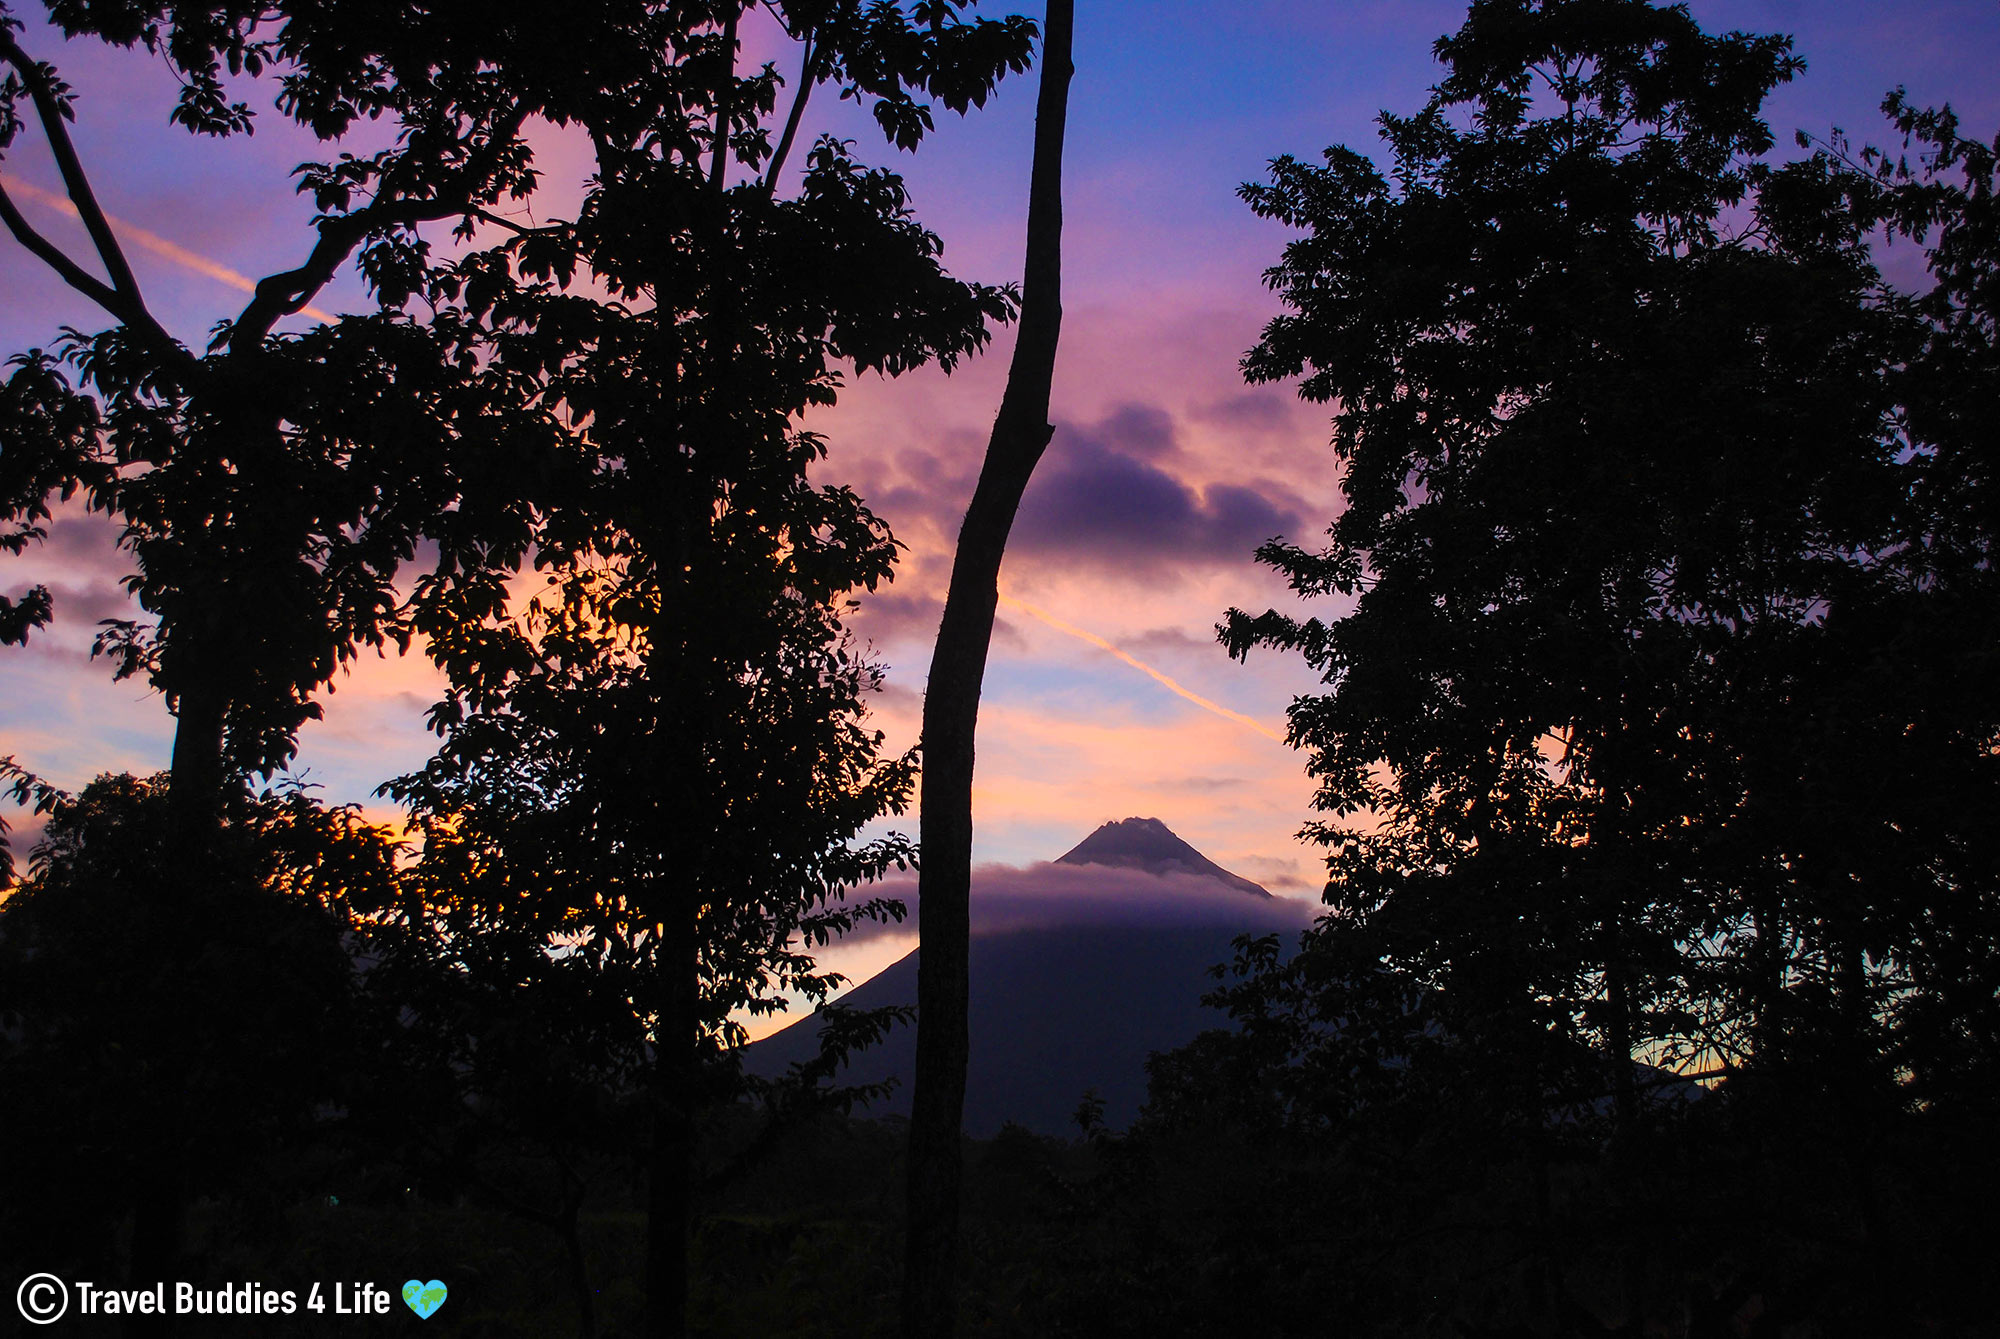 Arenal Volcano With Tree's And Purple Sky, La Fortuna, Costa Rica